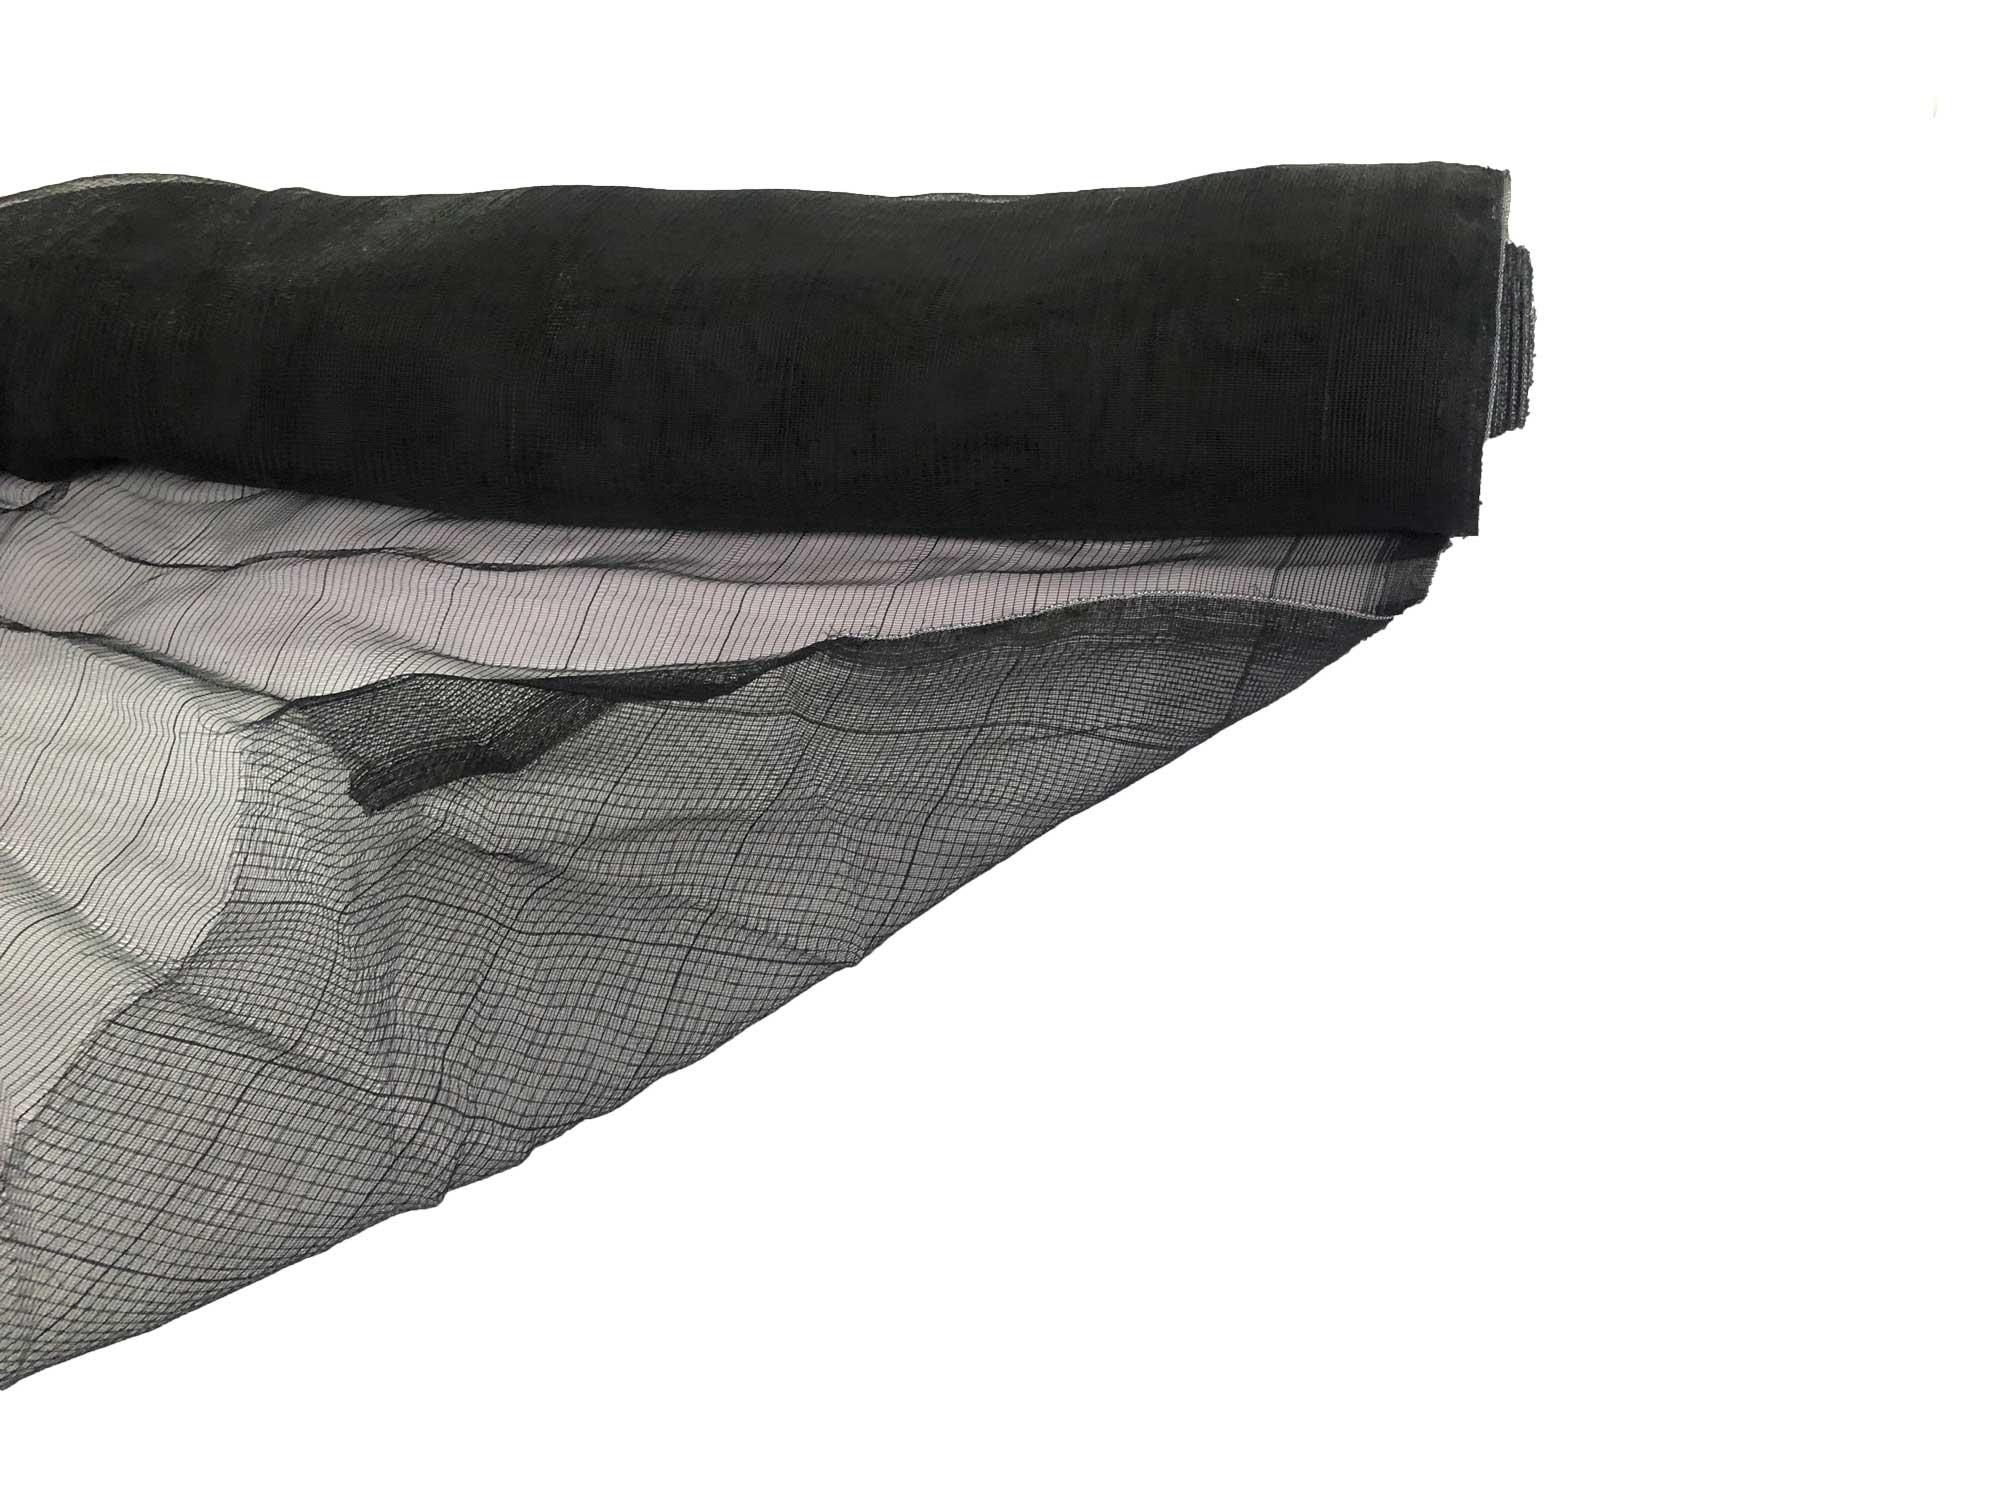 Tela Sombrite Nylon Monofilamento com Giro Inglês 50% 3x25